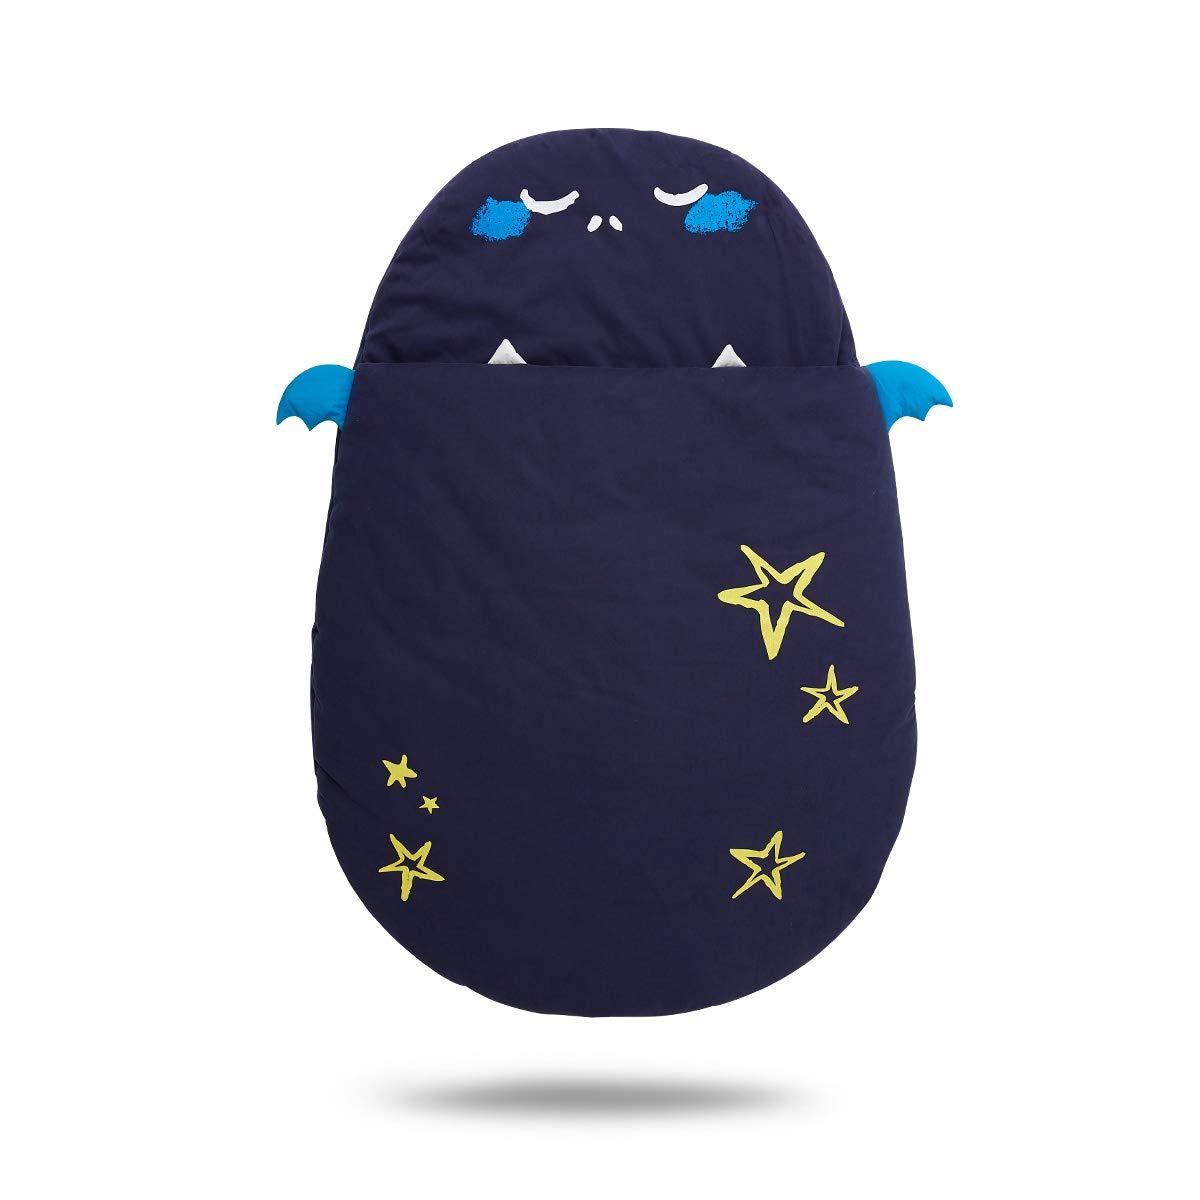 f210aba344d88 Bebamour Anti Kick Baby Sleeping Bag Safe Nights Cotton Baby Sleep Bag 2.5  Tog 0-18 Months and Above Cute Infant Boy Girls Sleeping Sack Baby Wrap  Blanket ...